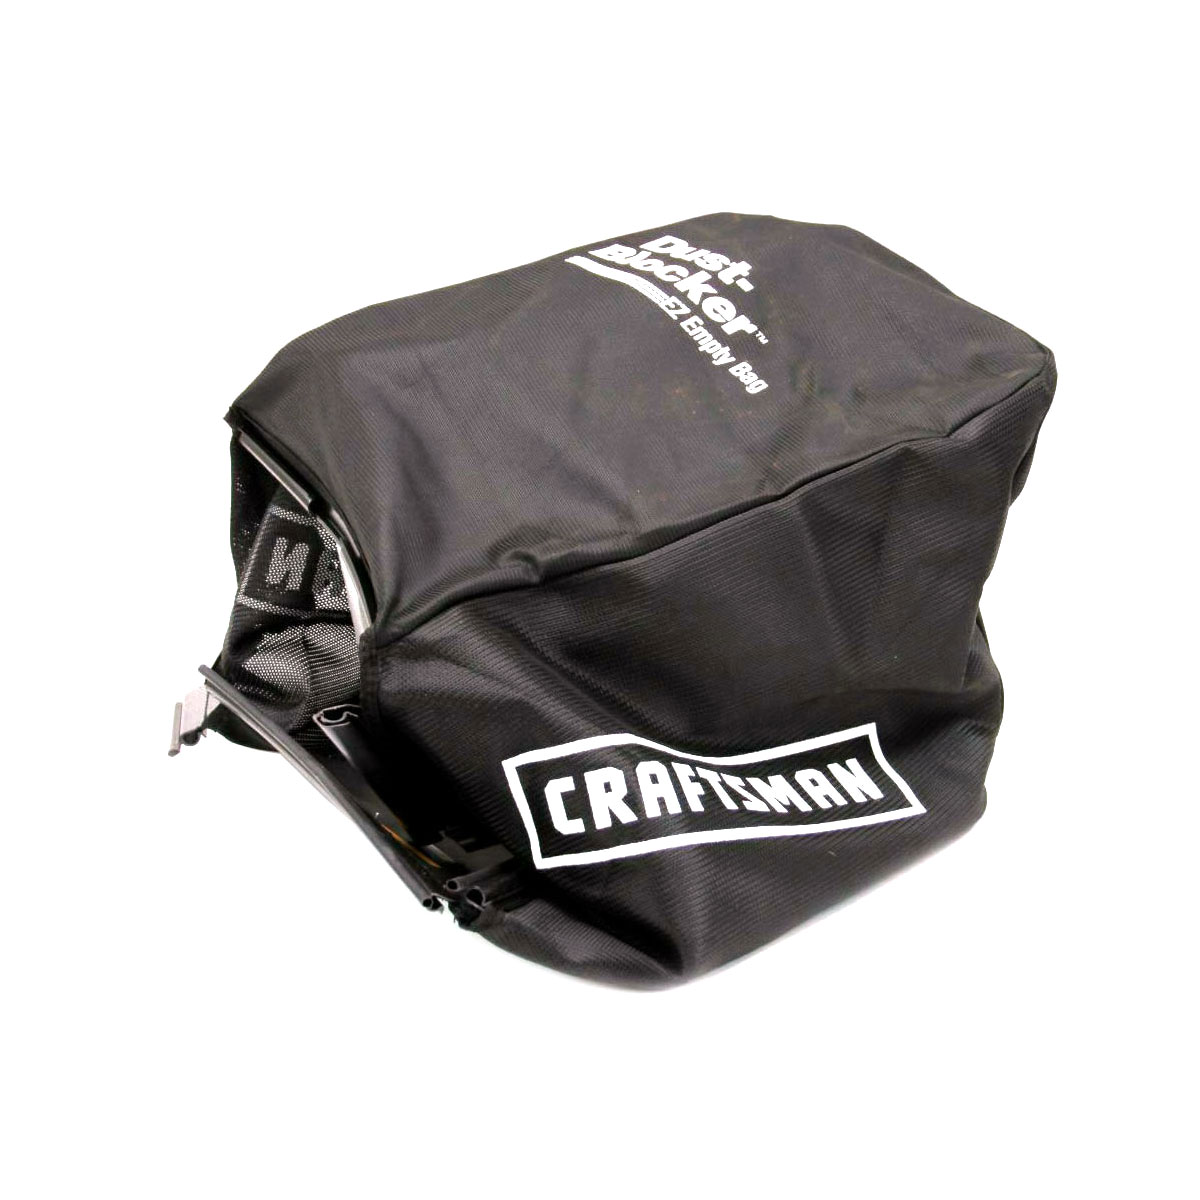 Husqvarna Grass Bag A1640113b Blk Craft Wht 580947303